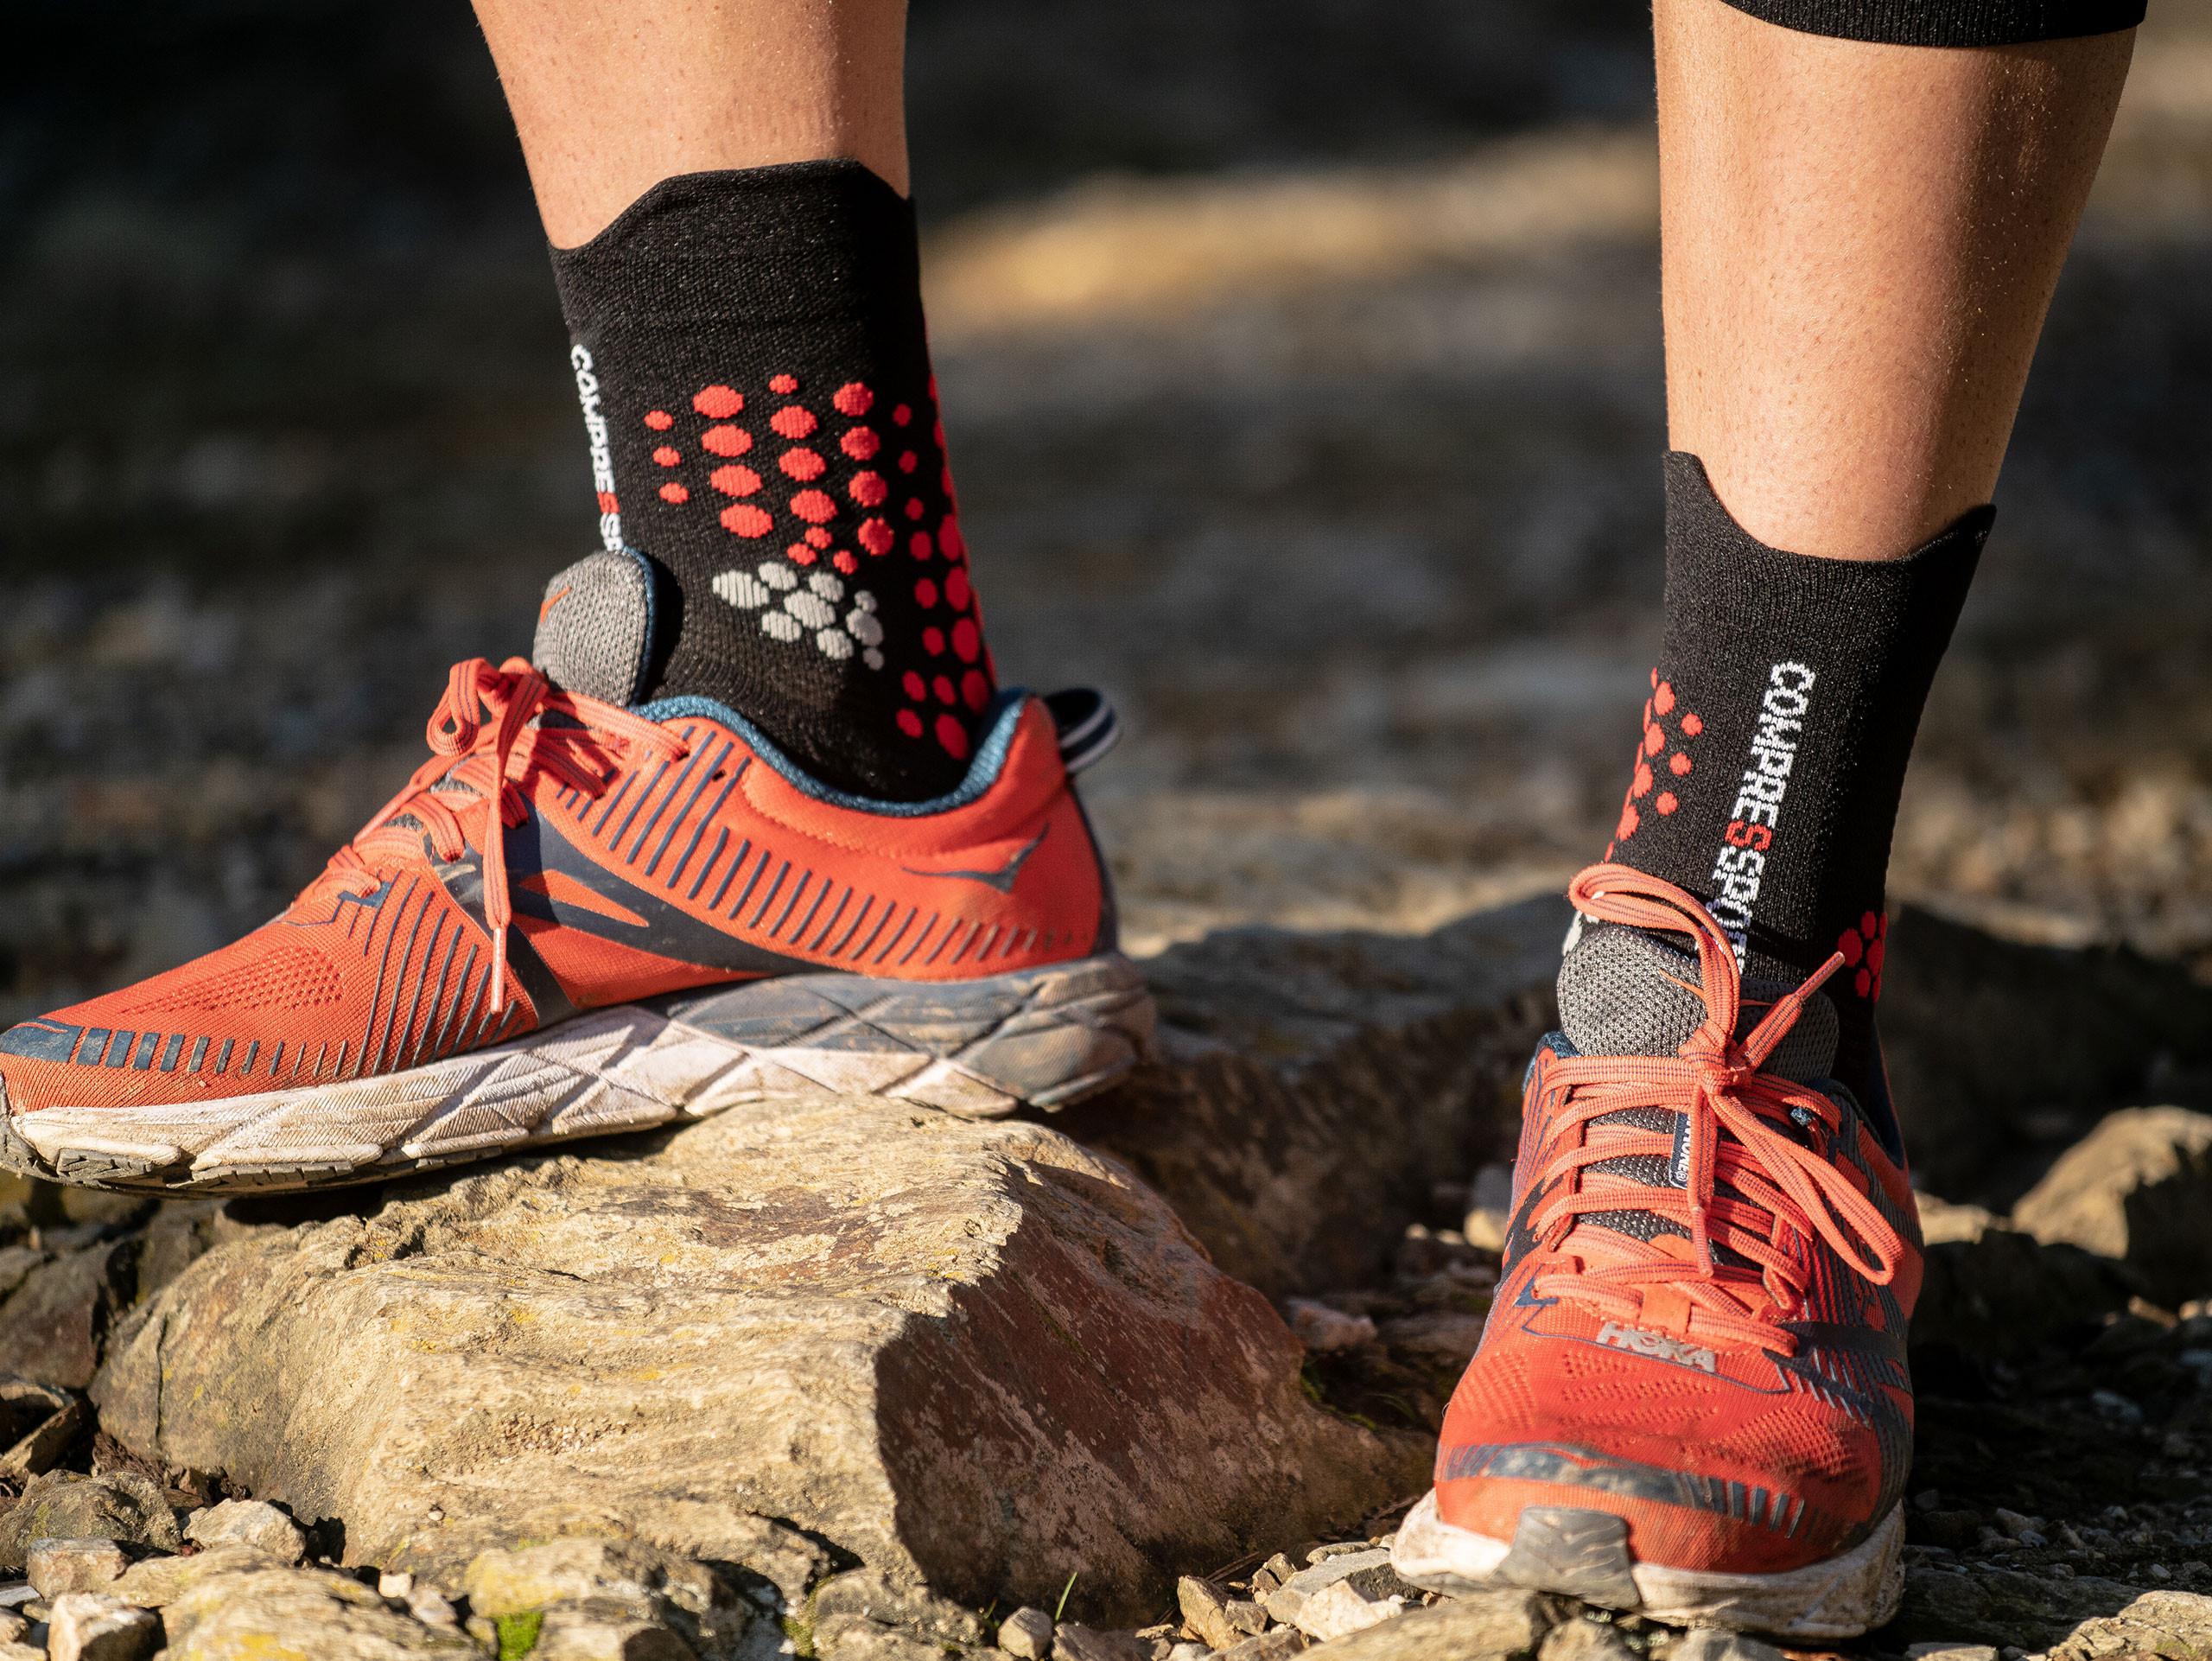 Calcetines deportivos pro v3.0 Trail negro/rojo